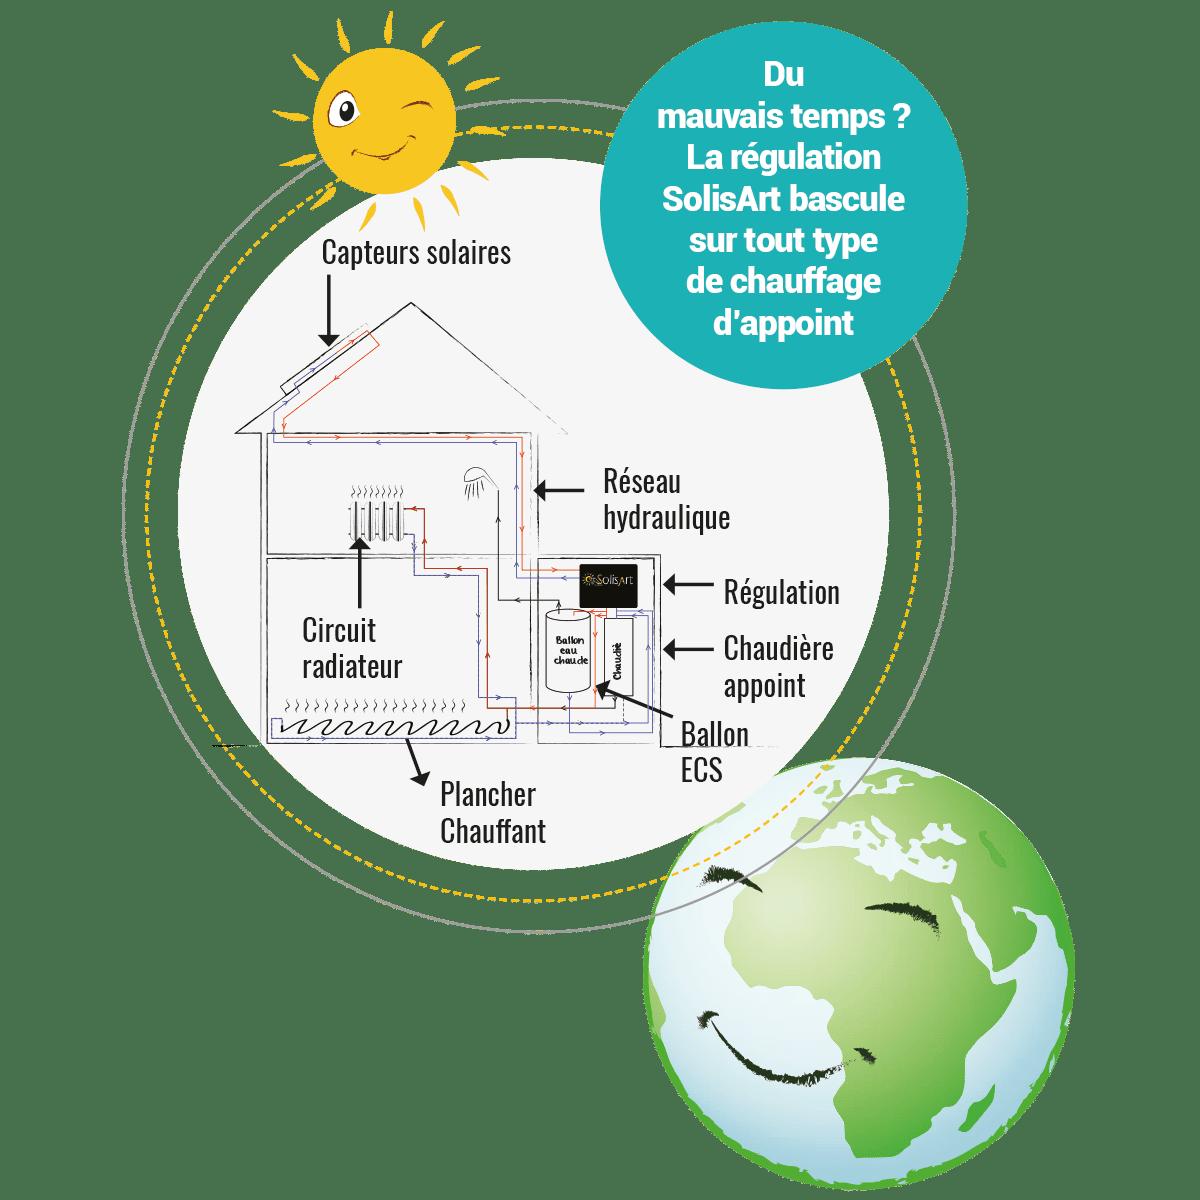 chauffage solaire, comment ça marche ?